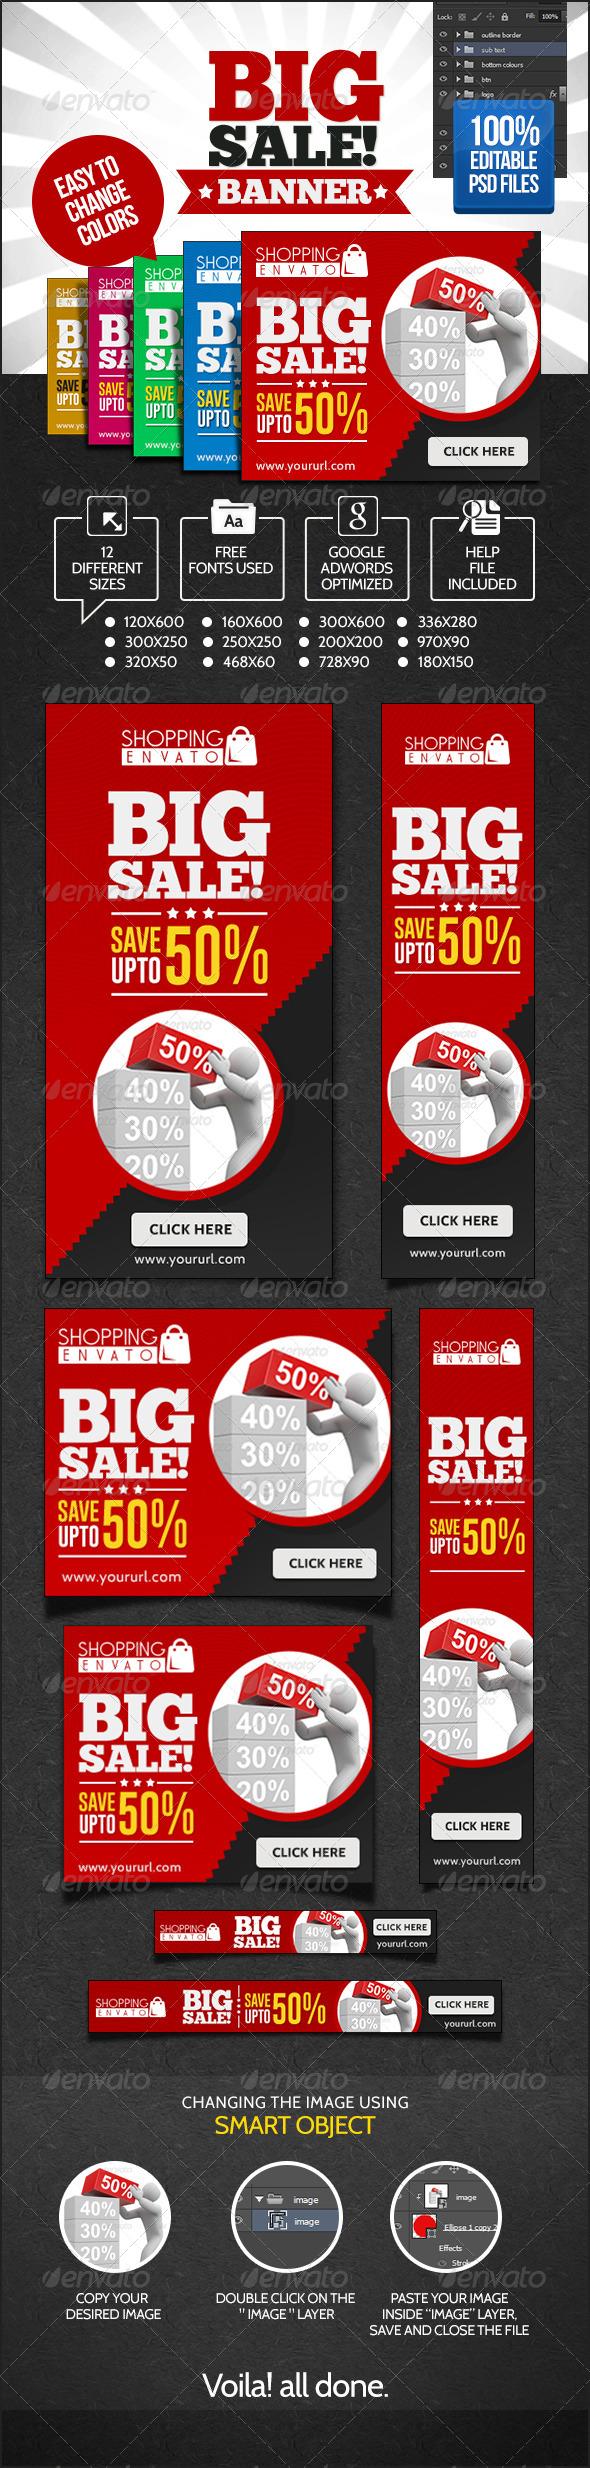 Big Sales Banner Set - Banners & Ads Web Elements